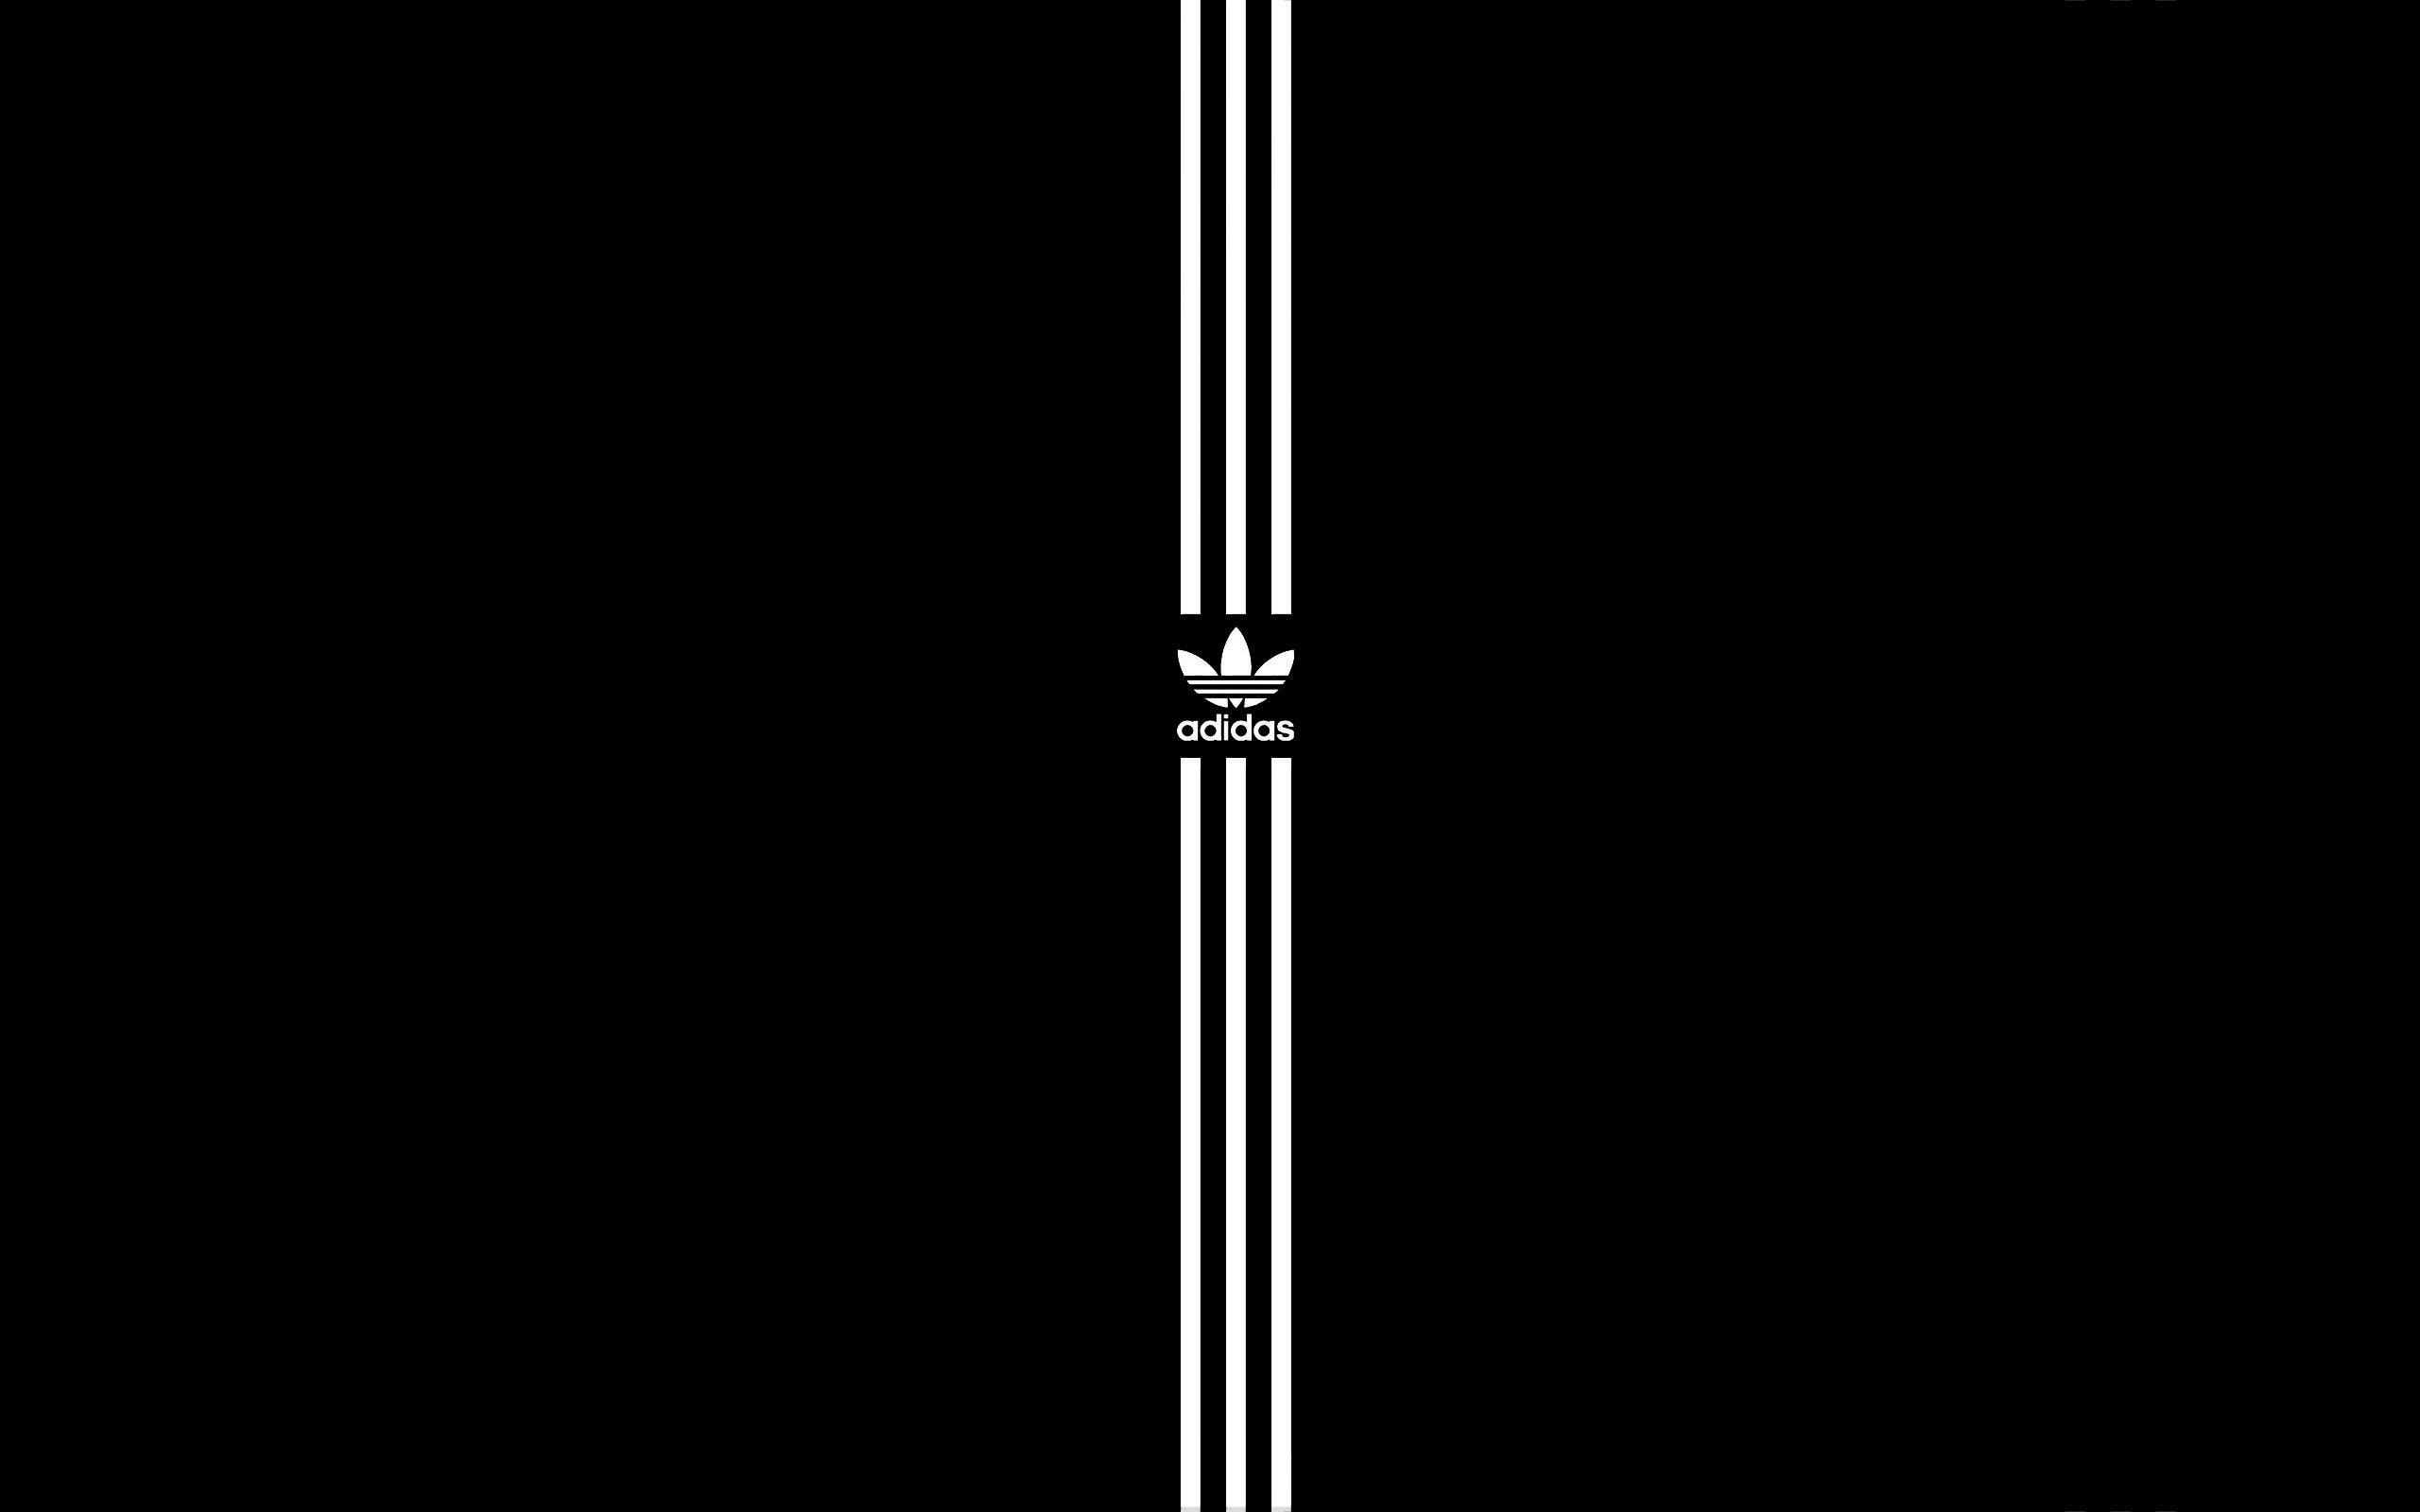 Tumblr iphone wallpaper adidas - Fantastic Adidas Wallpaper 45217 2560x1600 Px Hdwallsource